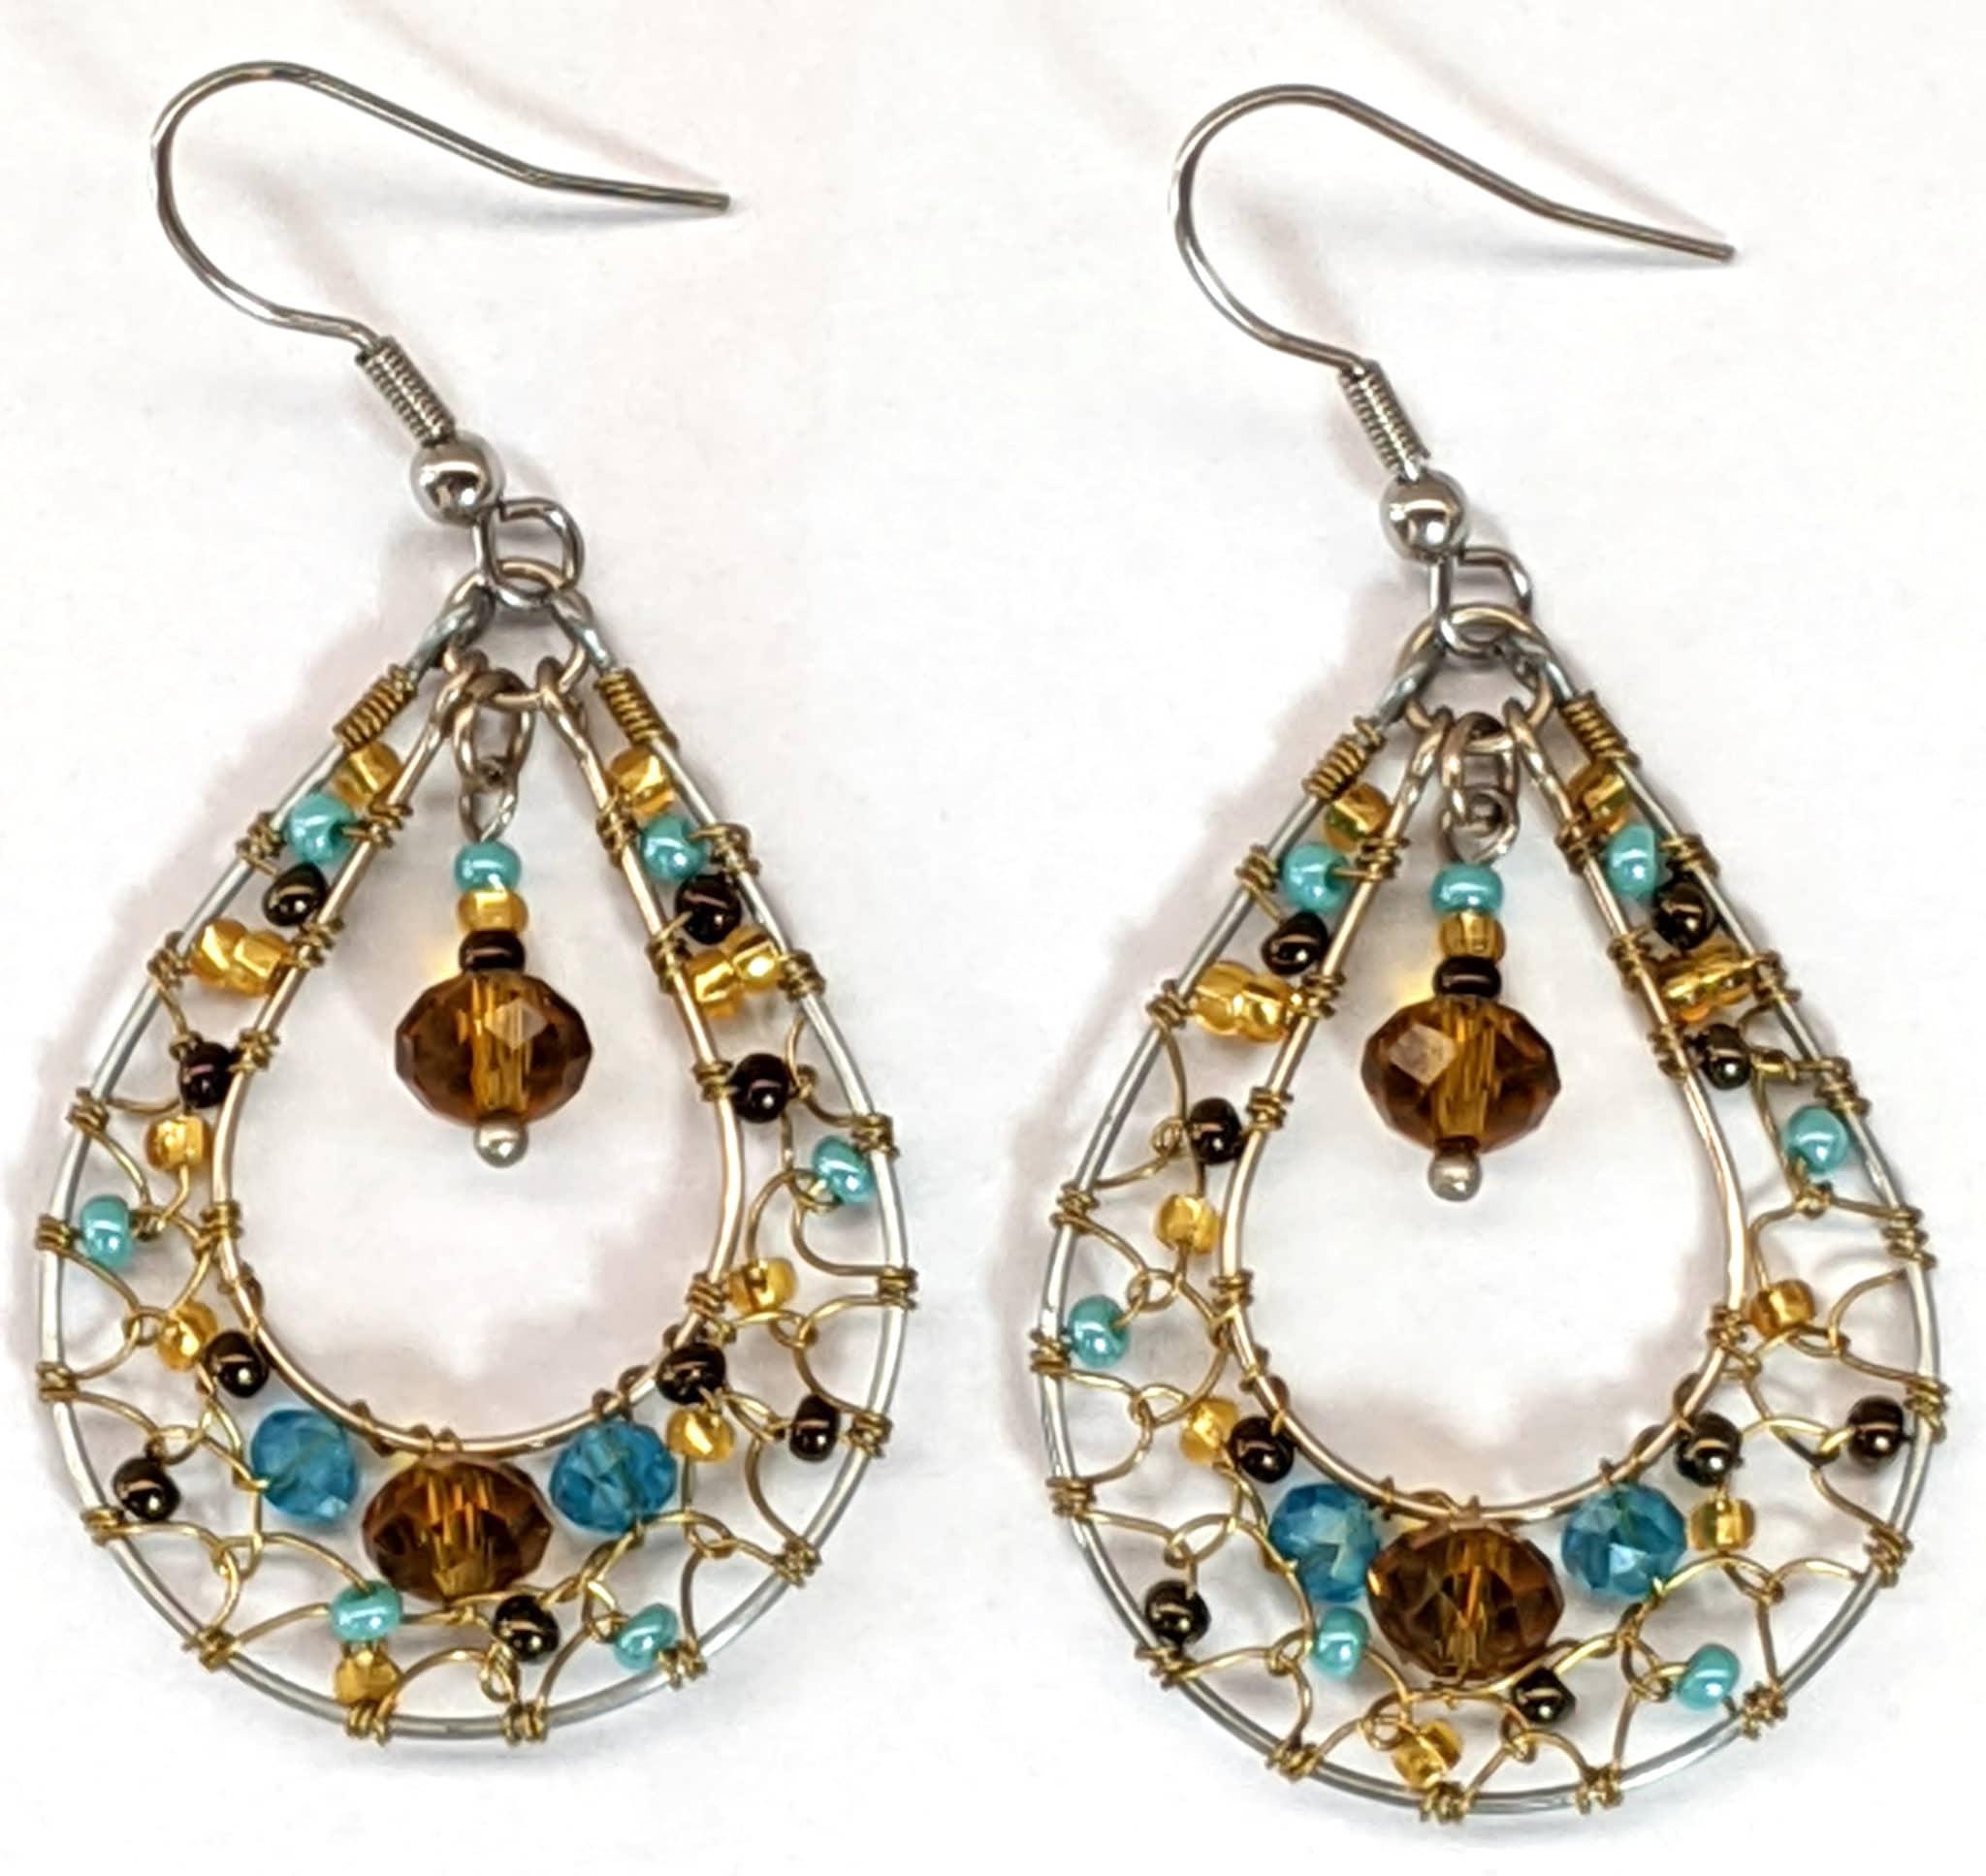 Teardrop Dreamcatcher Beaded Earrings - Turquoise and Copper